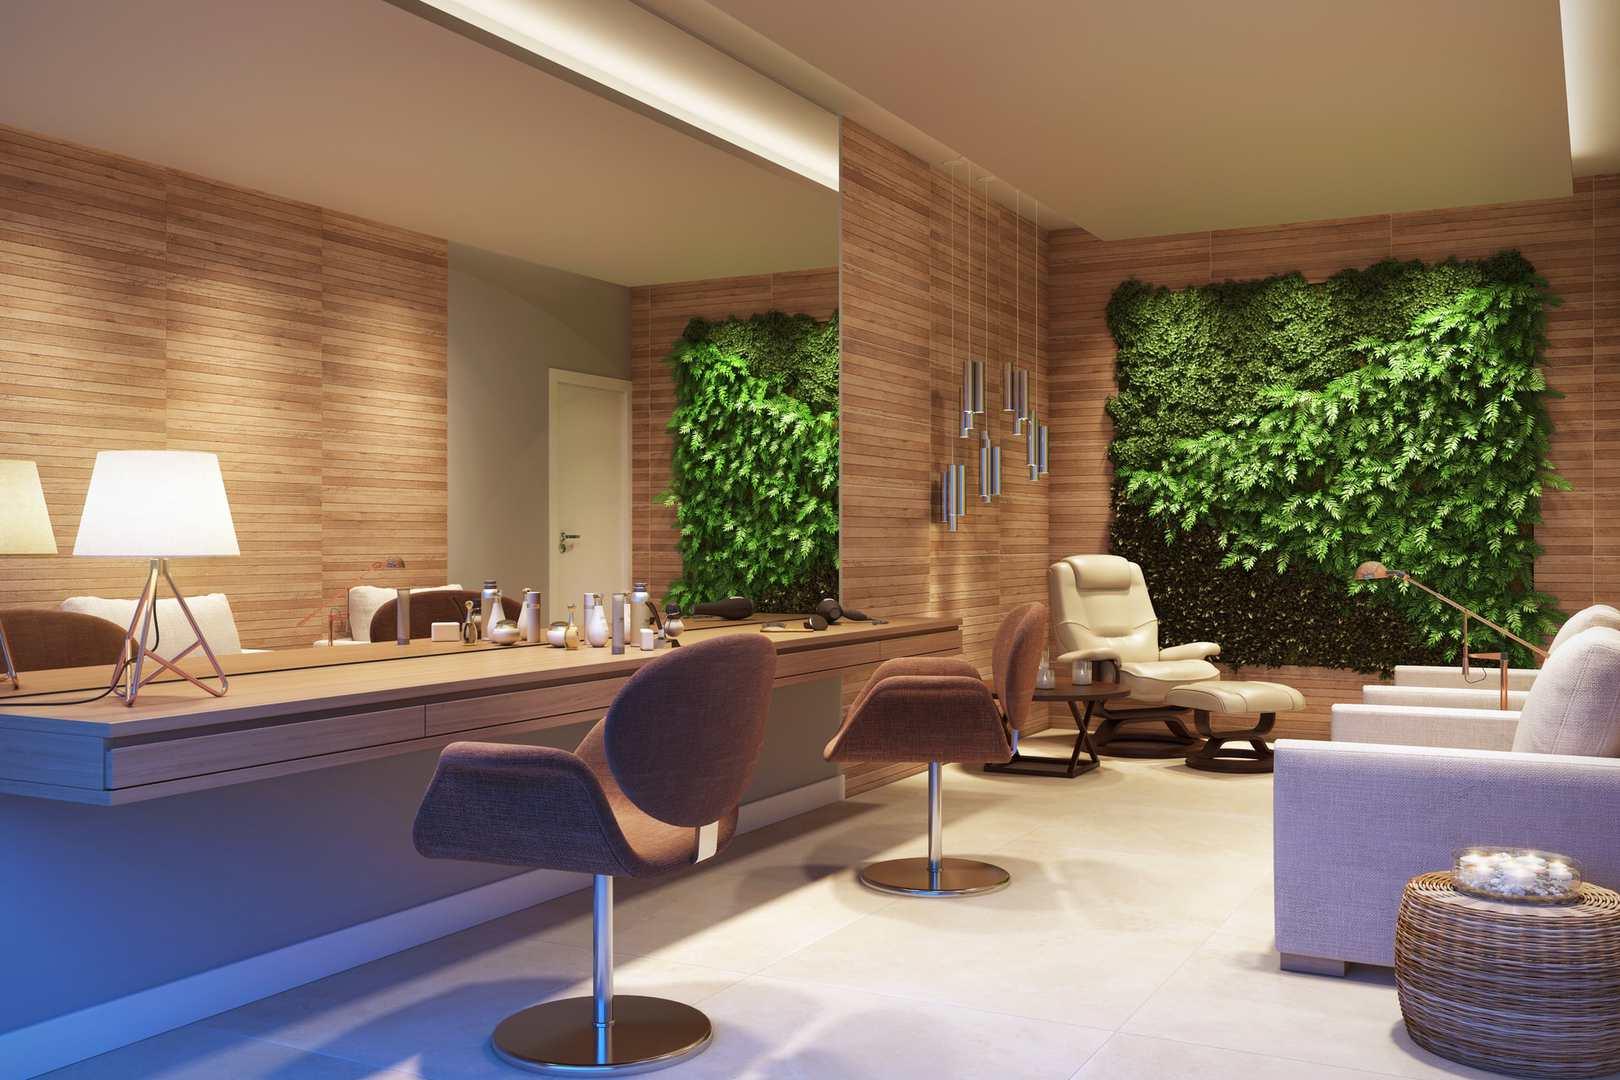 21-beauty-care-uber-miro-apartamento-ribeirao-preto